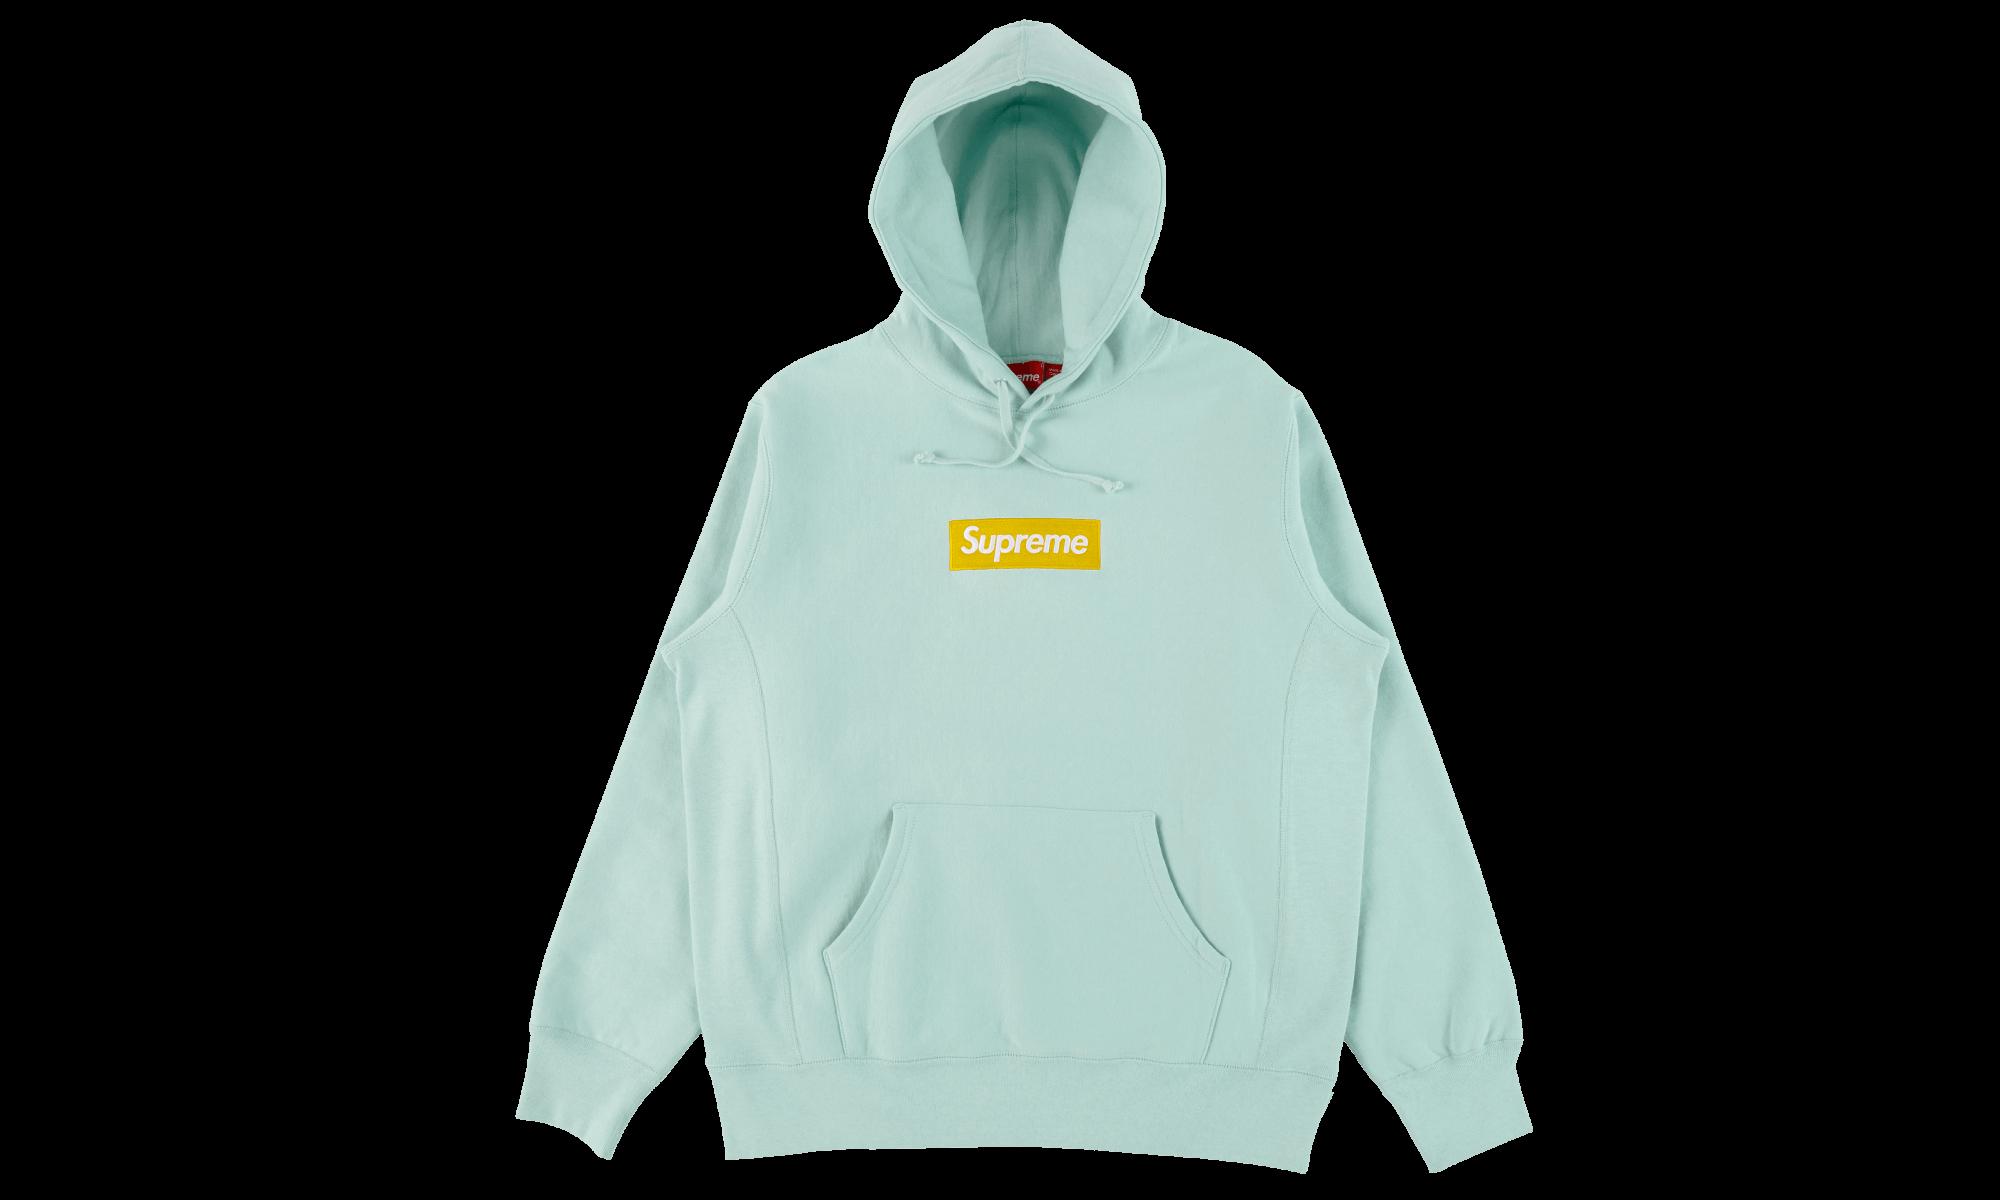 Supreme Box Logo Hooded Sweatshirt Fw 17 Su3145 Hooded Sweatshirts Sweatshirts Supreme Box Logo [ 1200 x 2000 Pixel ]